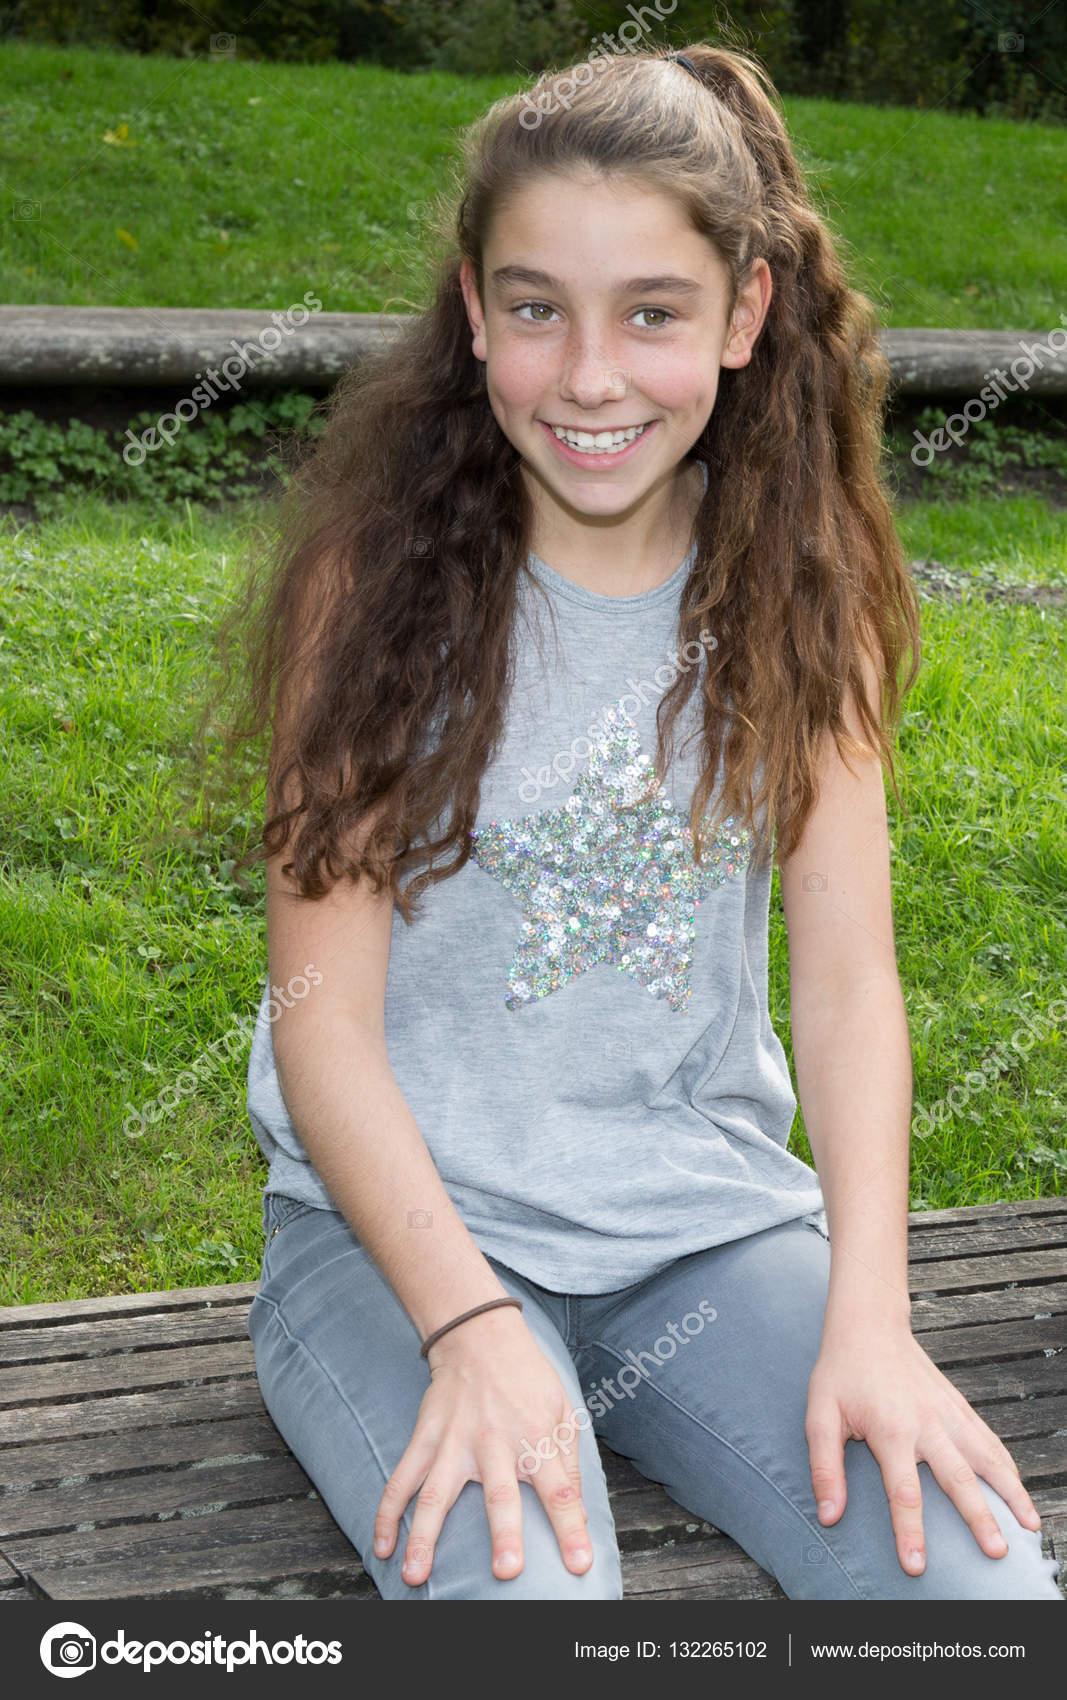 333 brunette teen